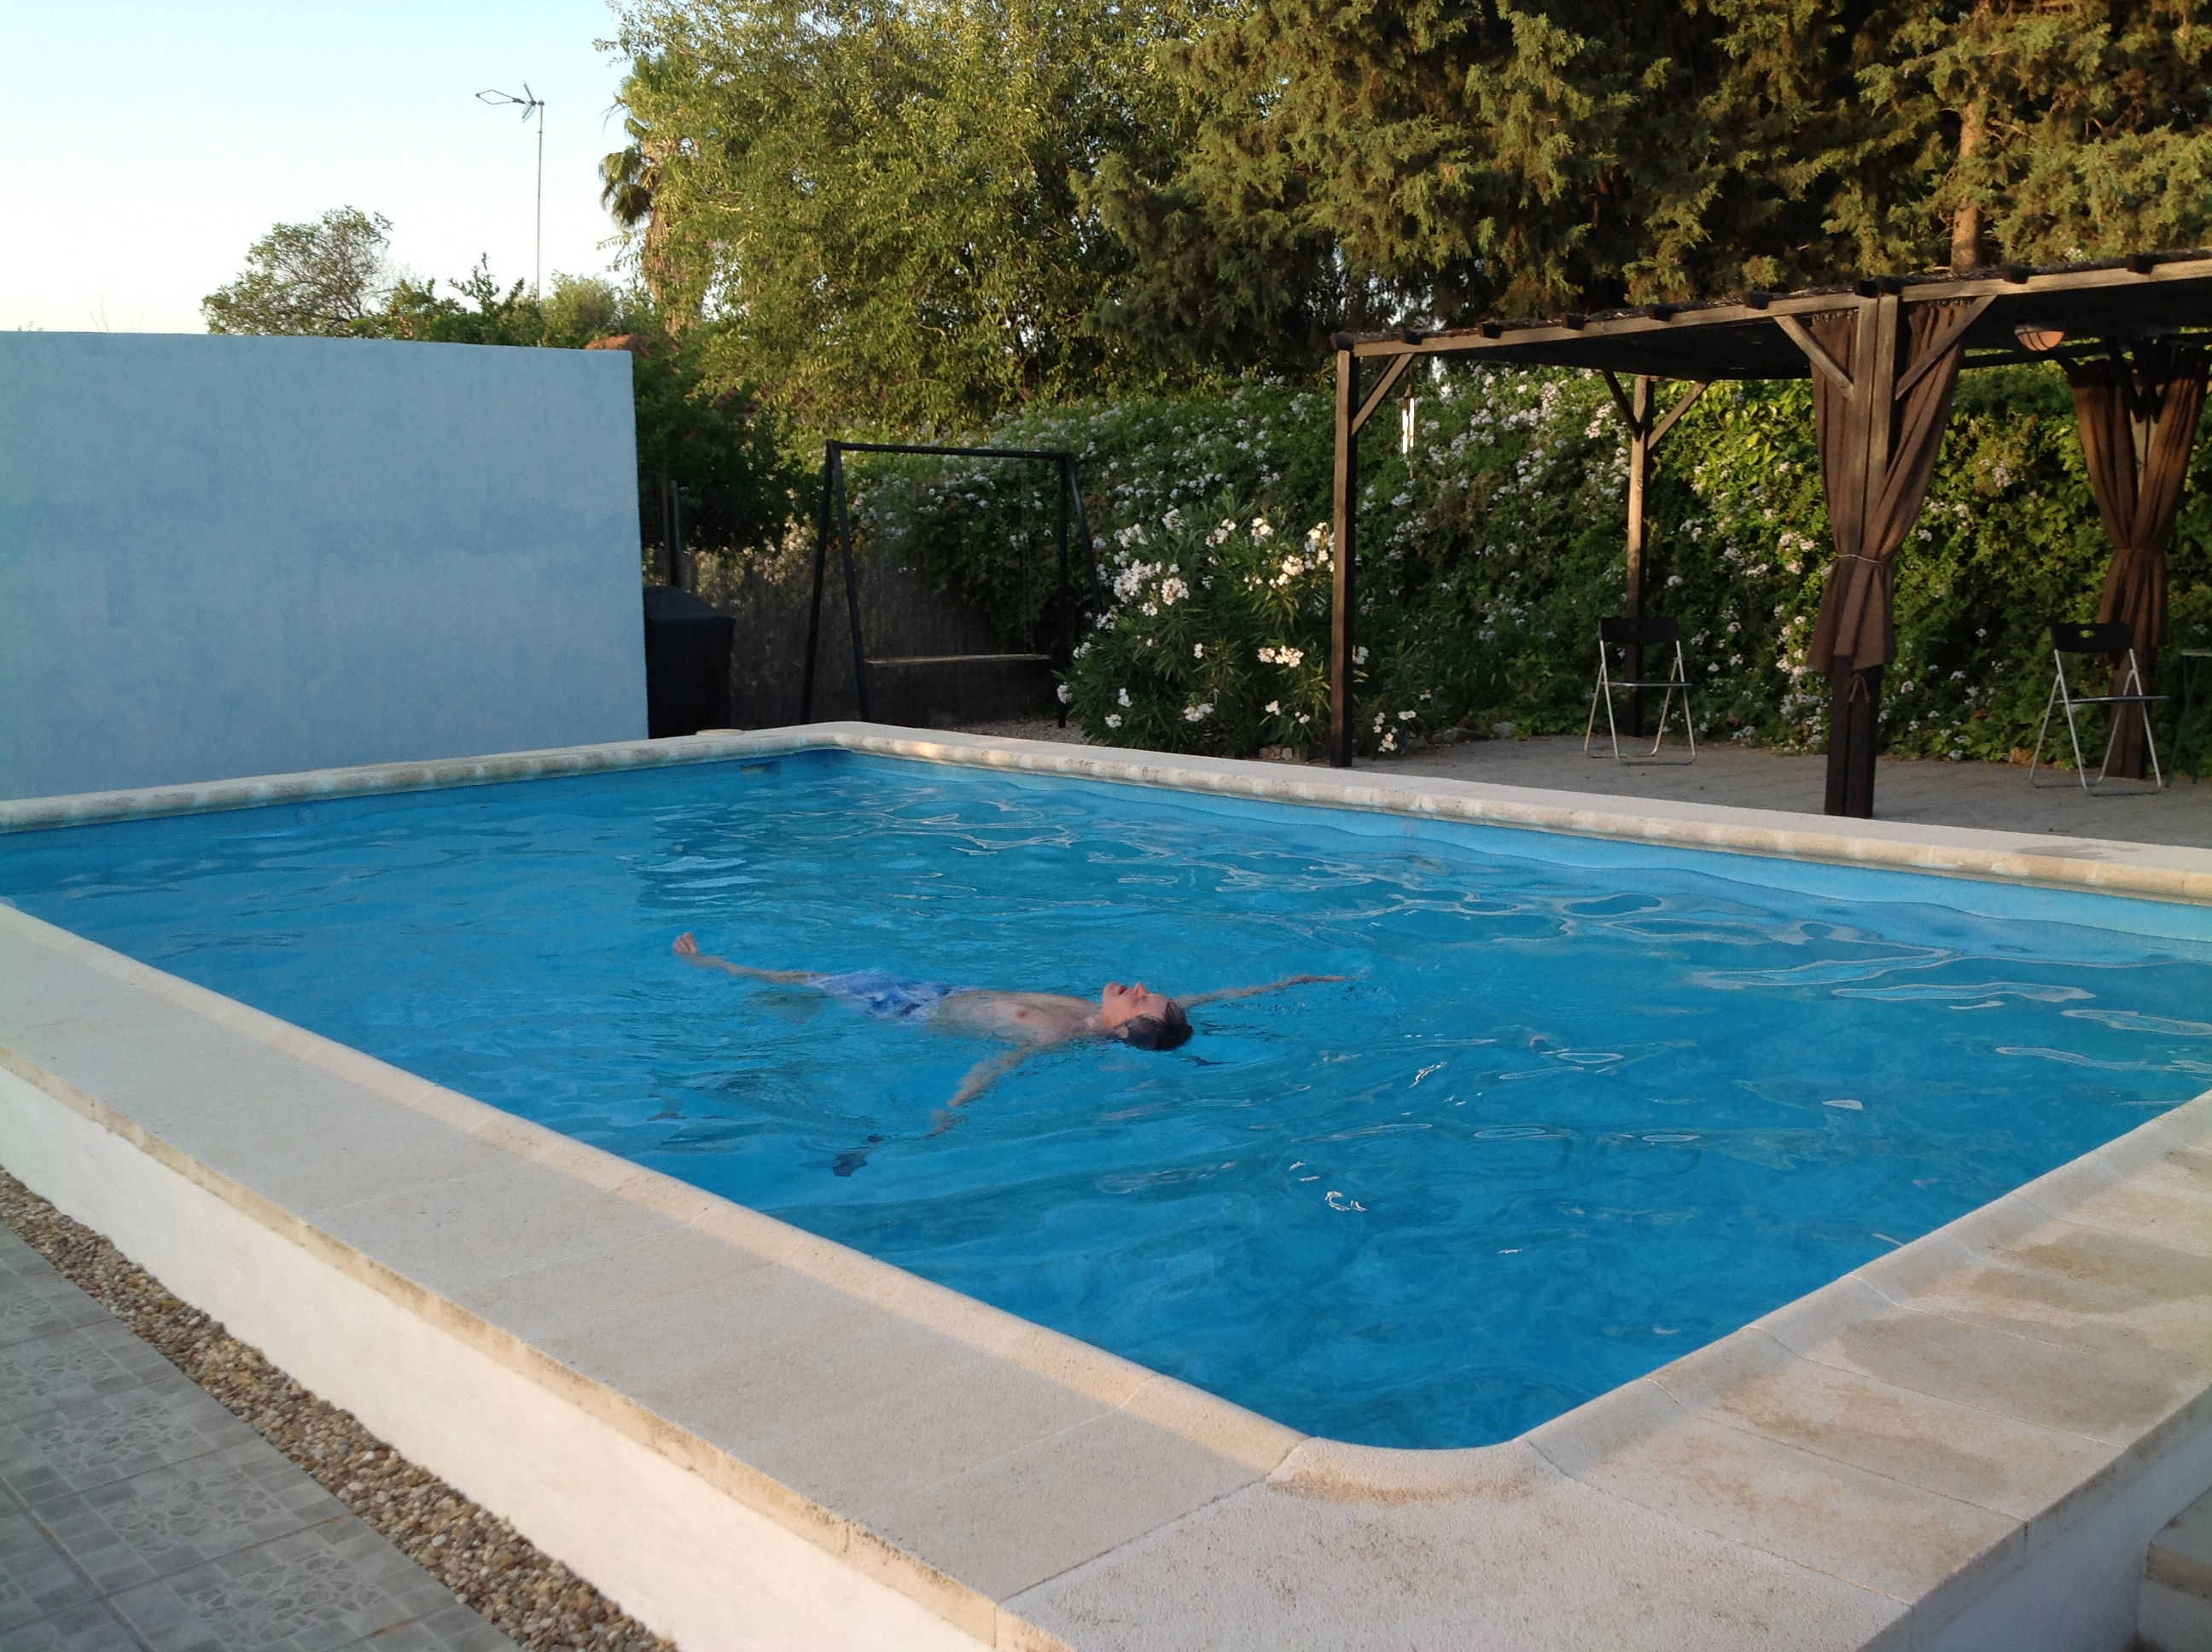 Acerico pool.